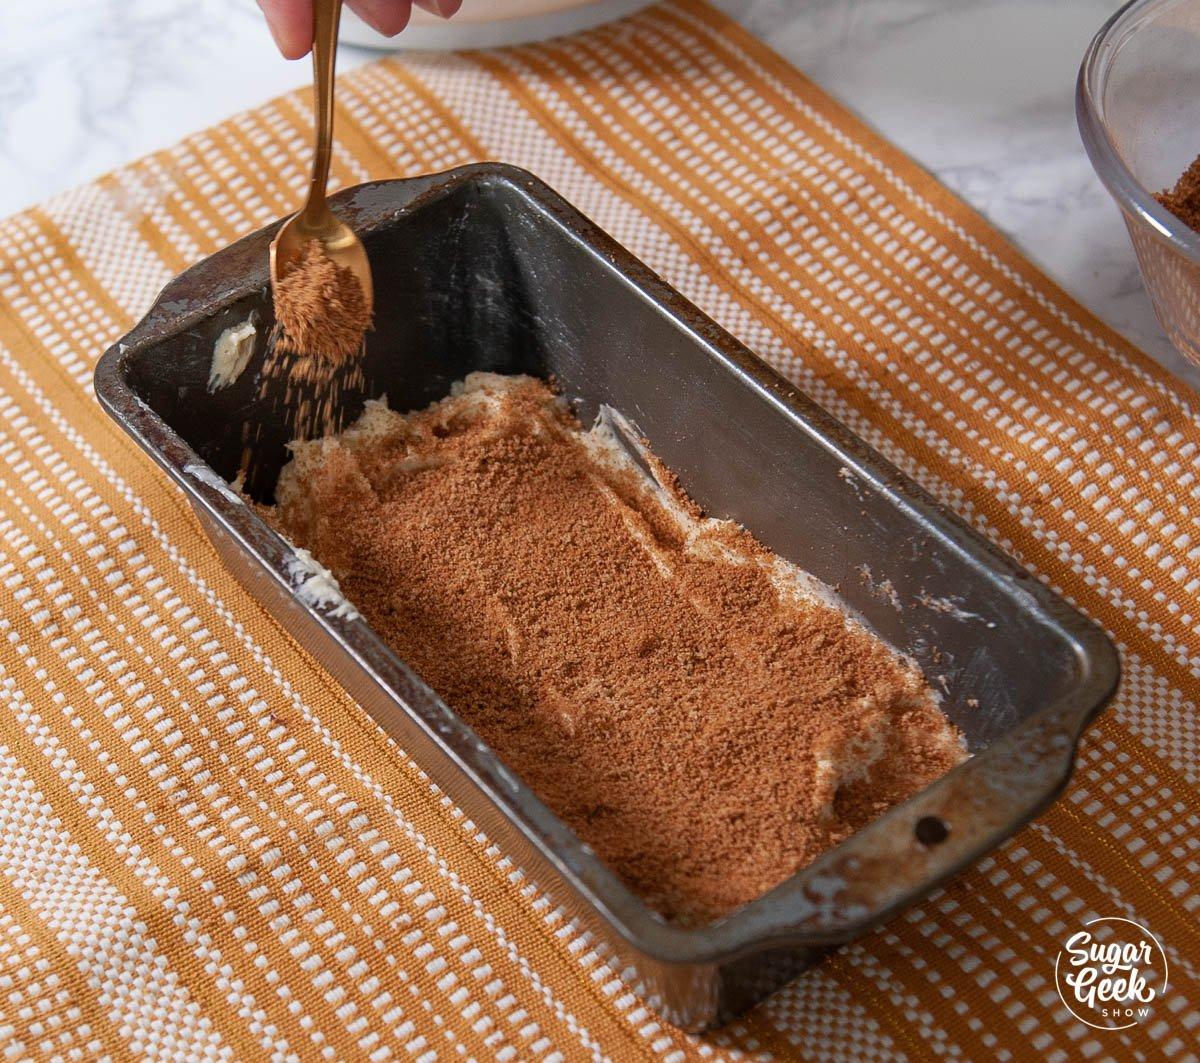 cinnamon sugar mix on cake batter